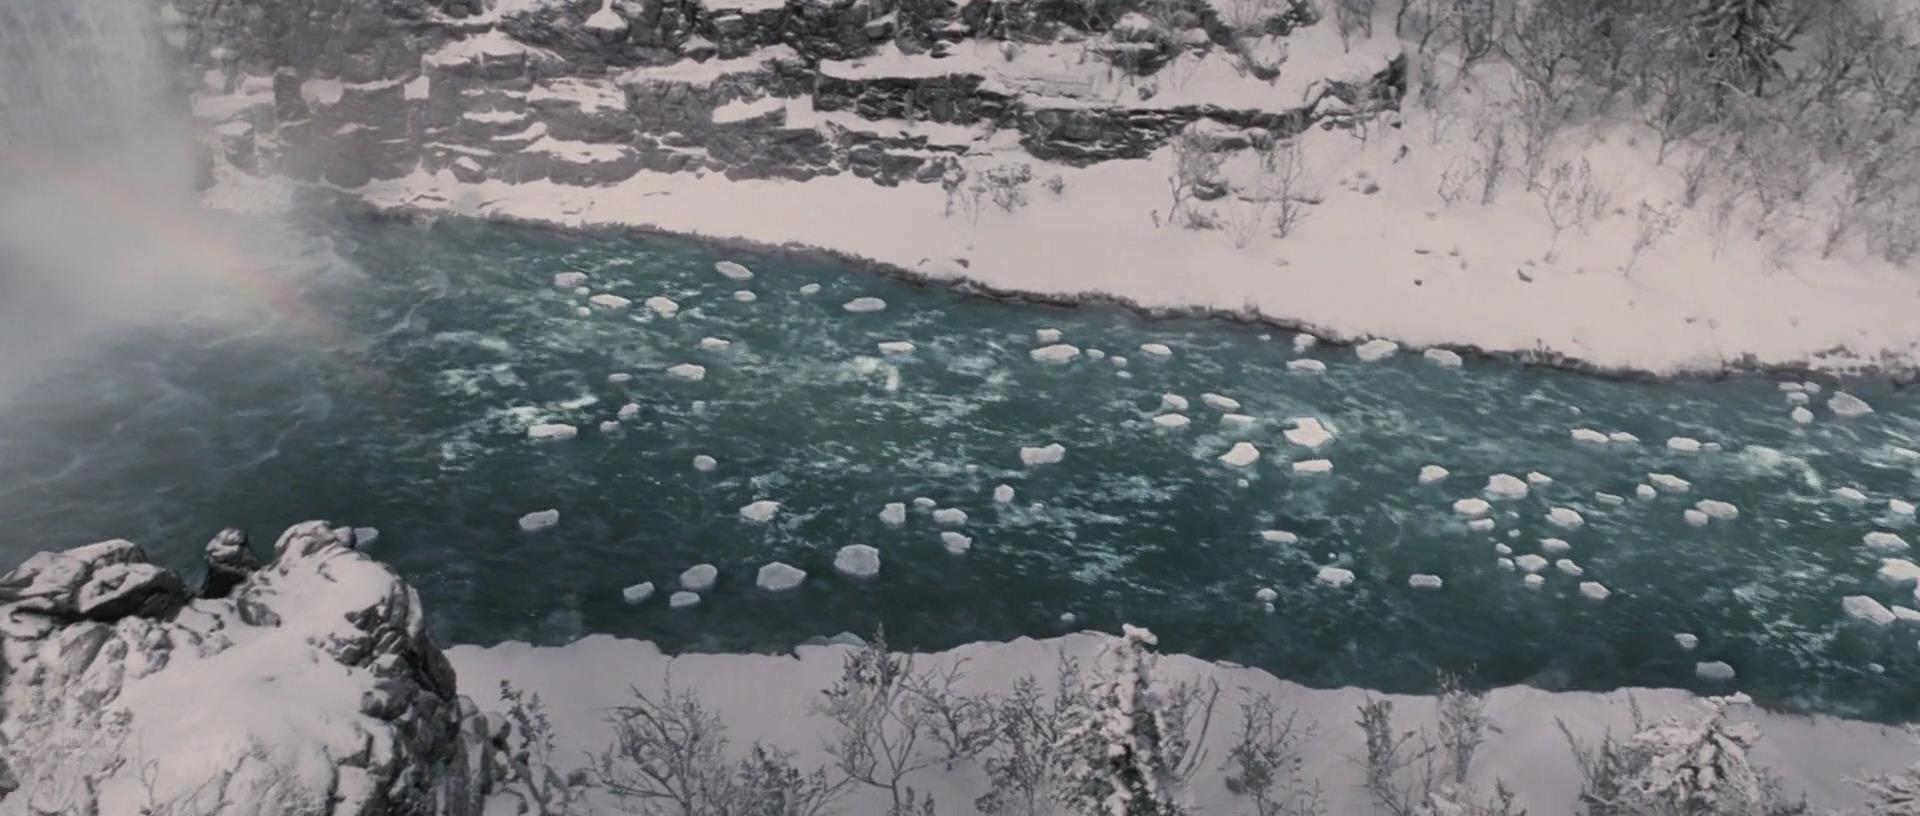 River Narnia